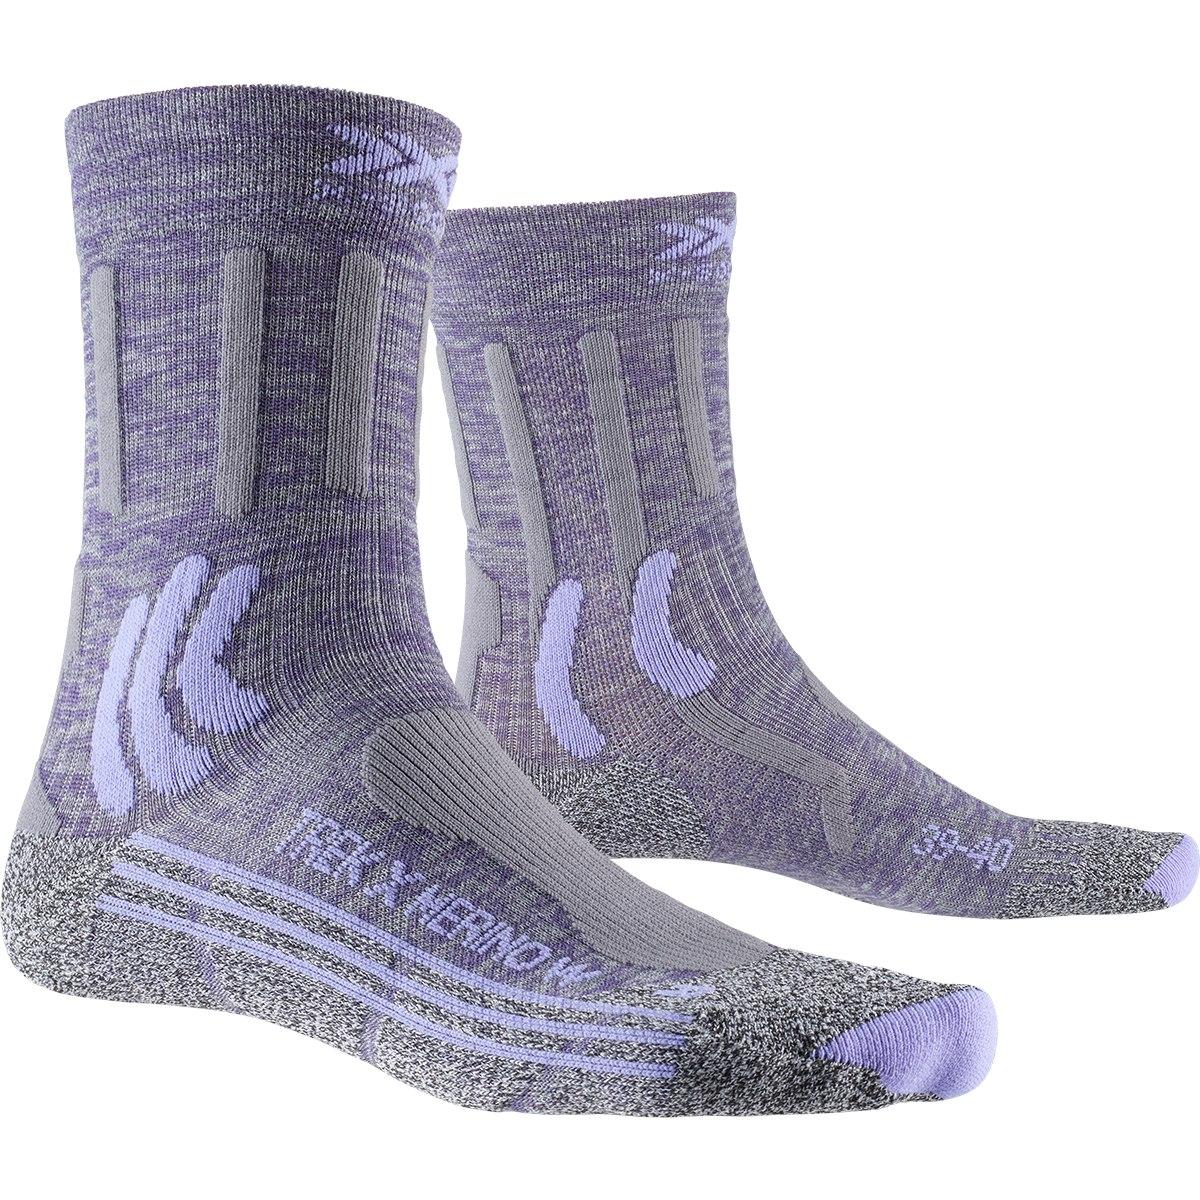 X-Socks Trek X Merino Women's Socks - grey purple melange/grey melange